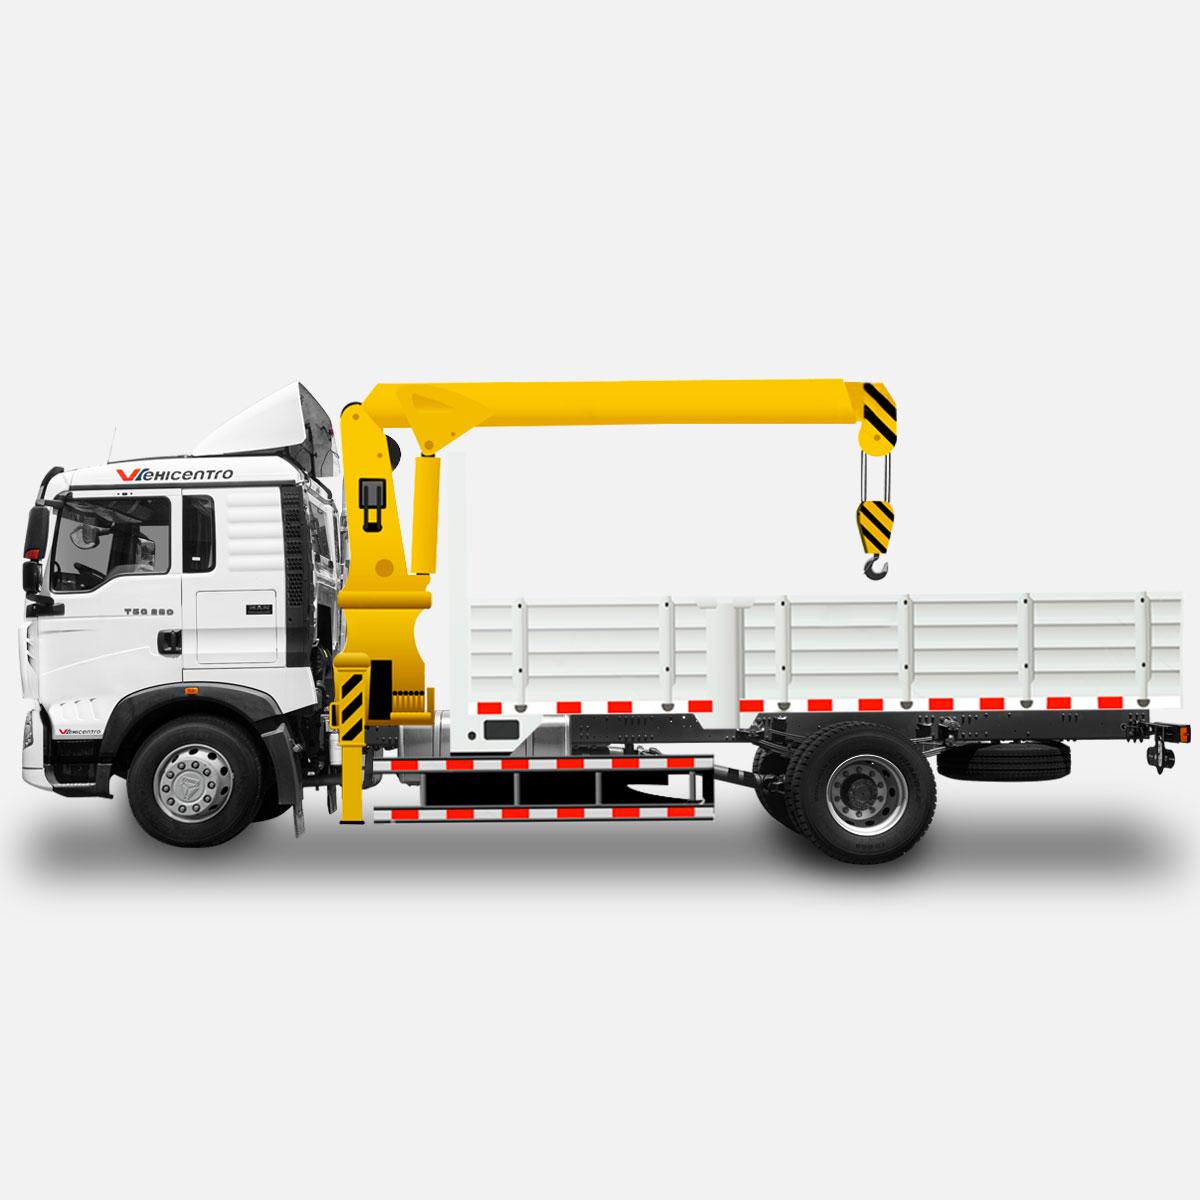 camion de 13 toneladas aplicaciones 4